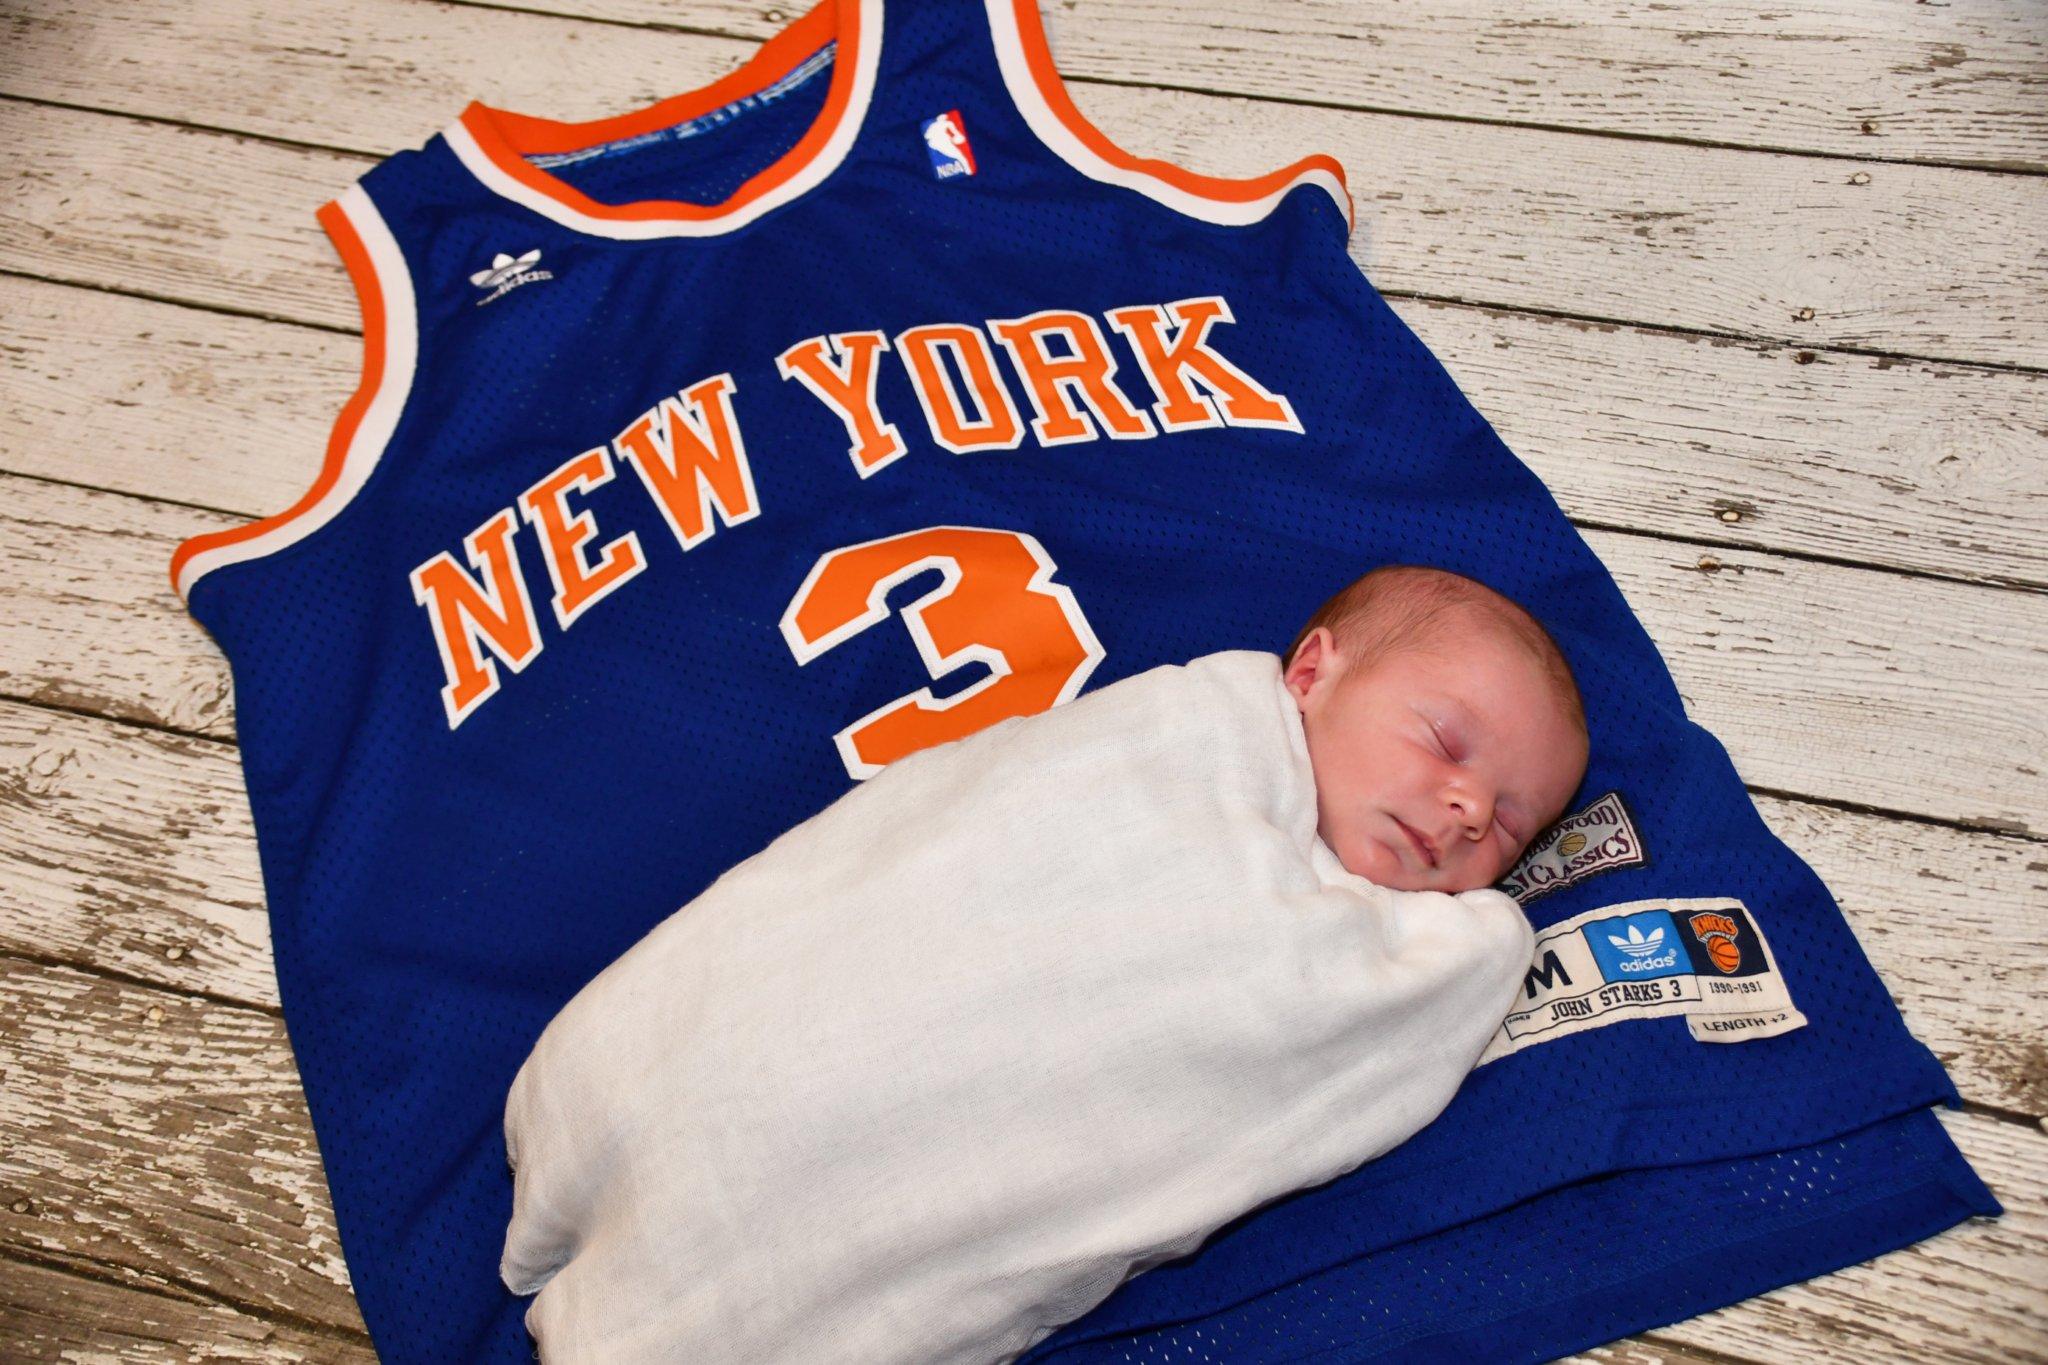 New York Knicks 2019-2020 Preview